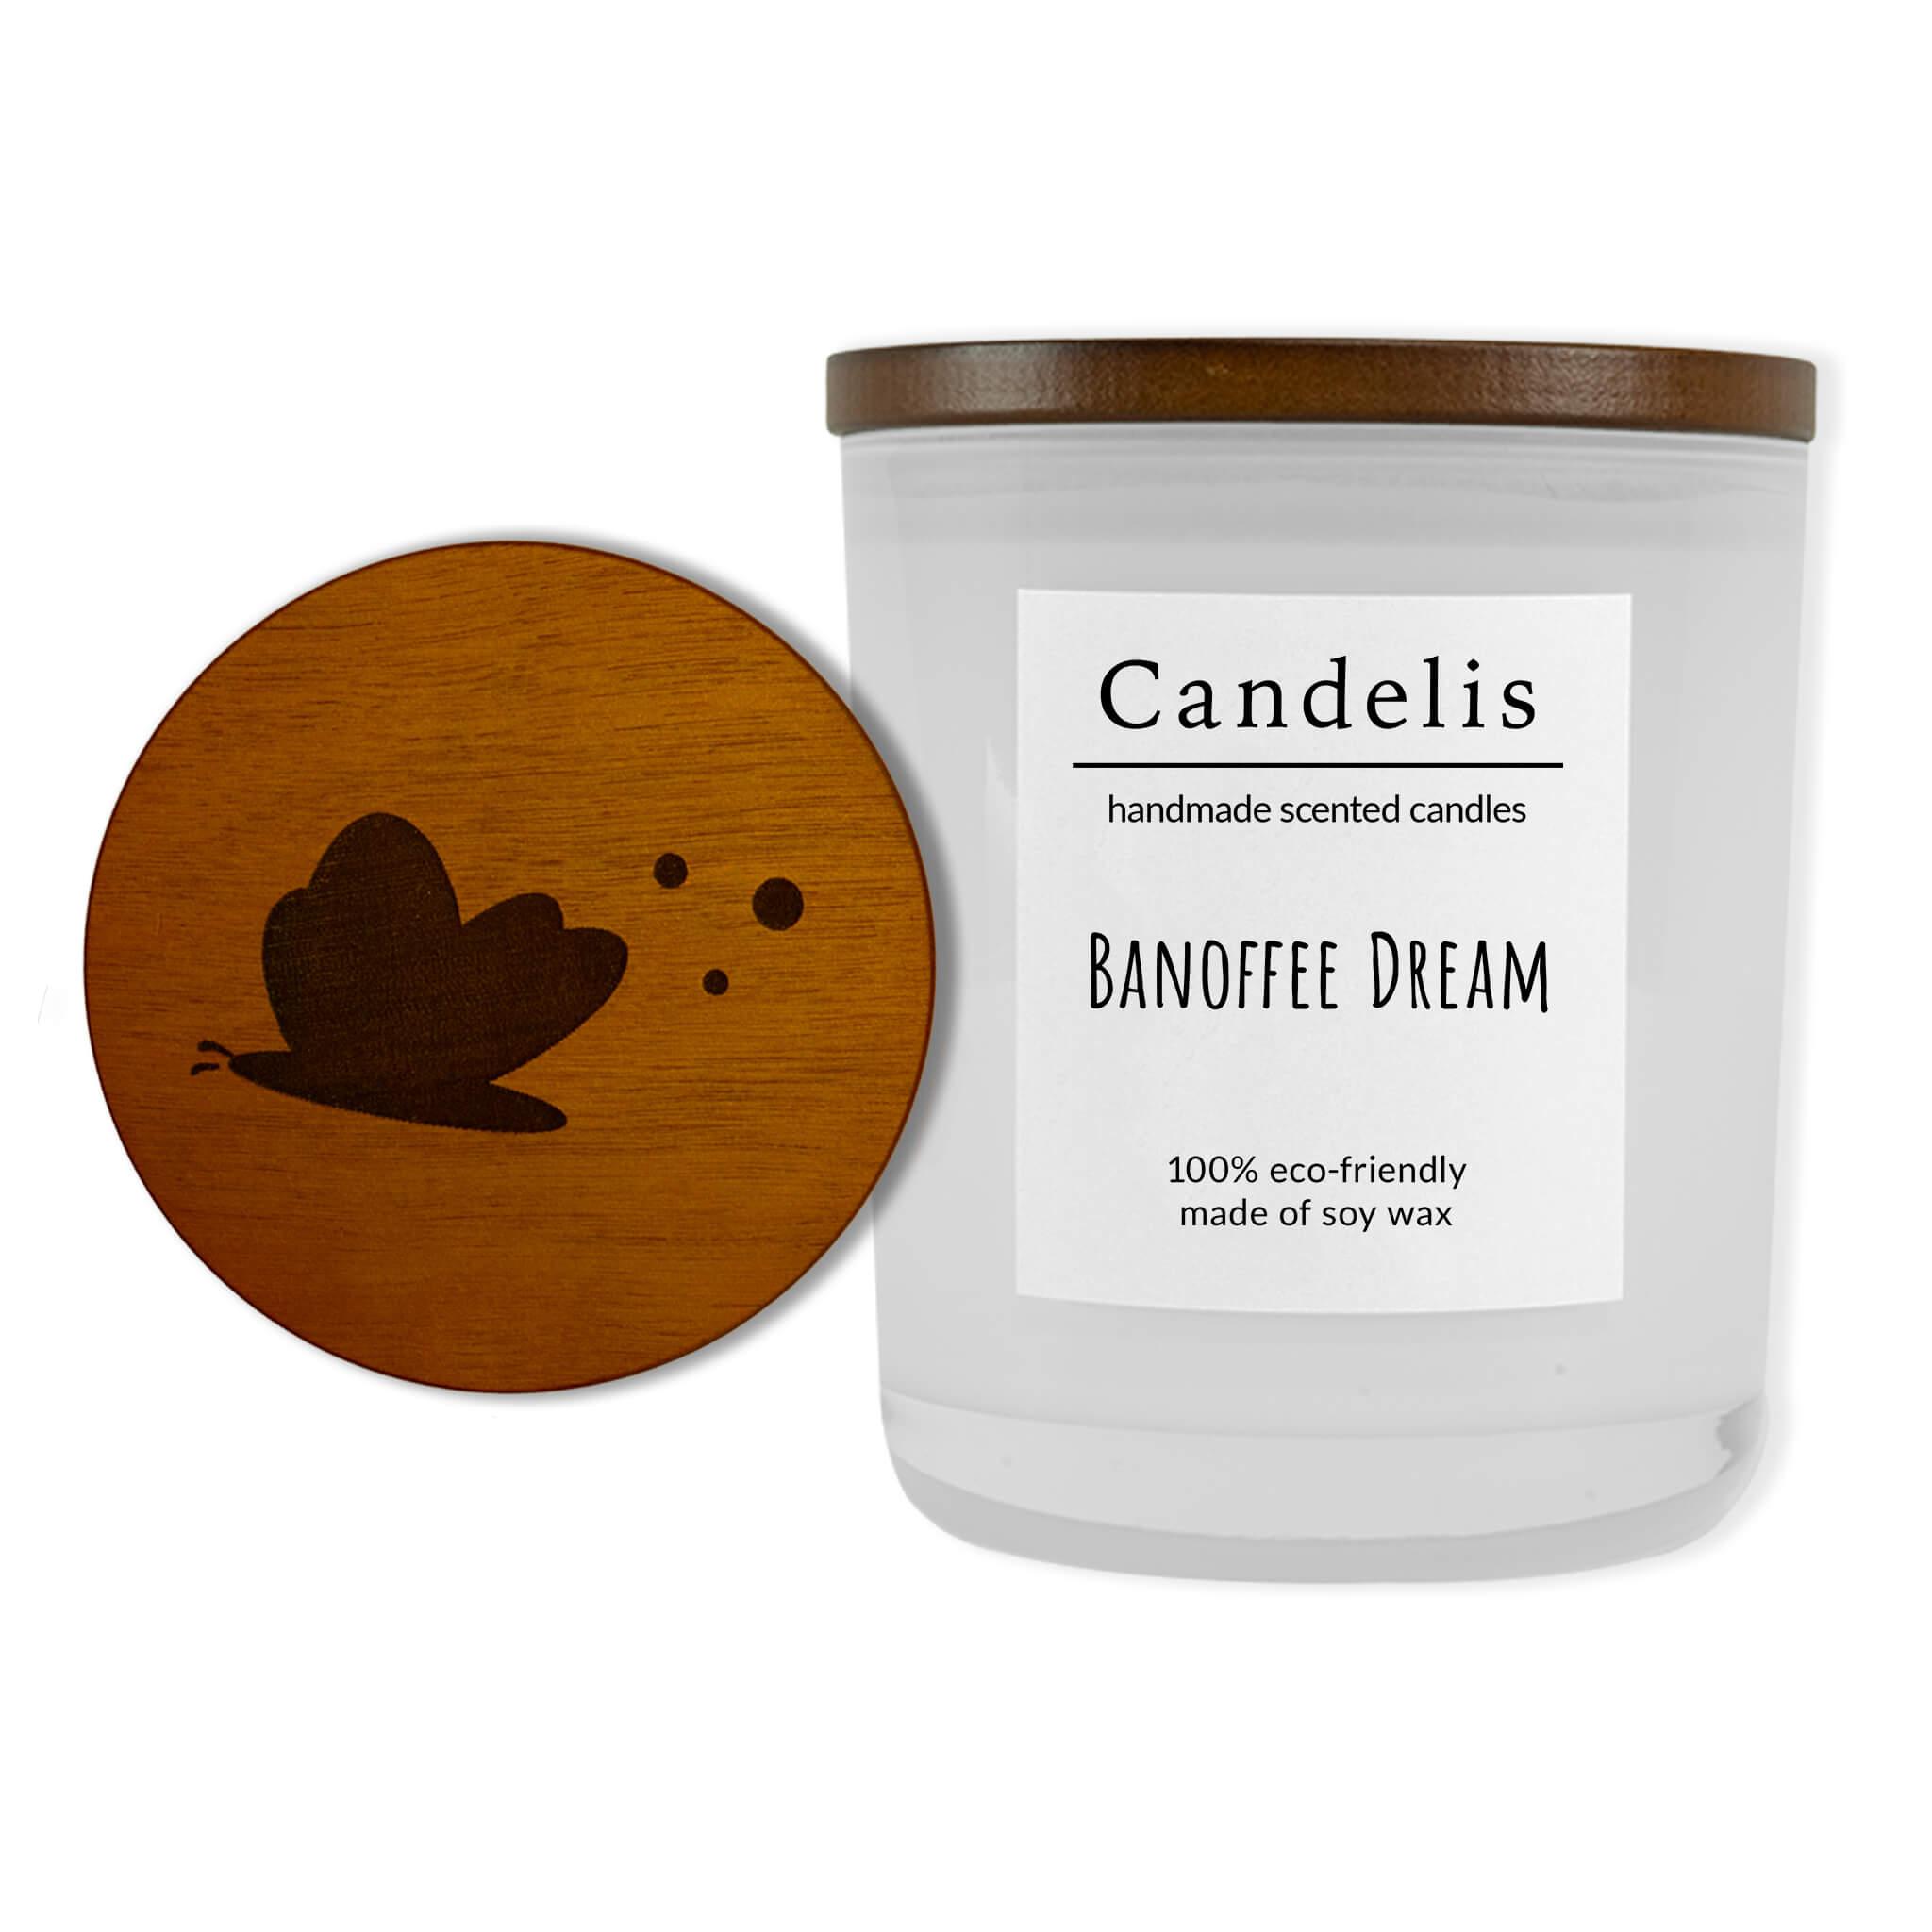 Banoffee Dream wit collectie